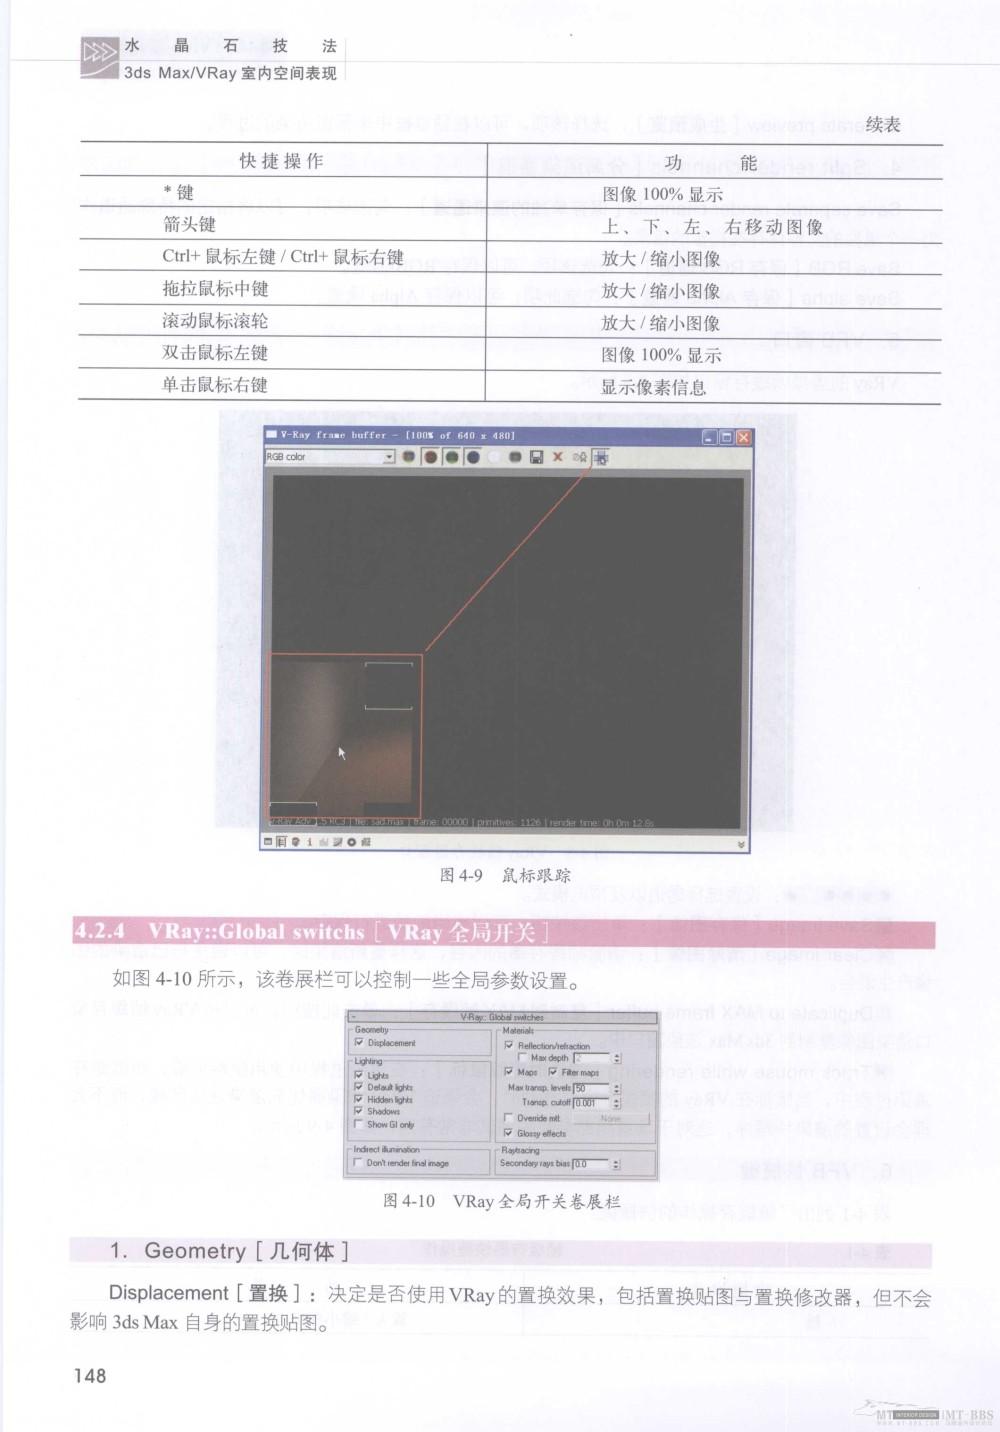 水晶石技法-3ds_Max&VRay室内空间表现_水晶石技法-3ds_Max&VRay室内空间表现_页面_154.jpg